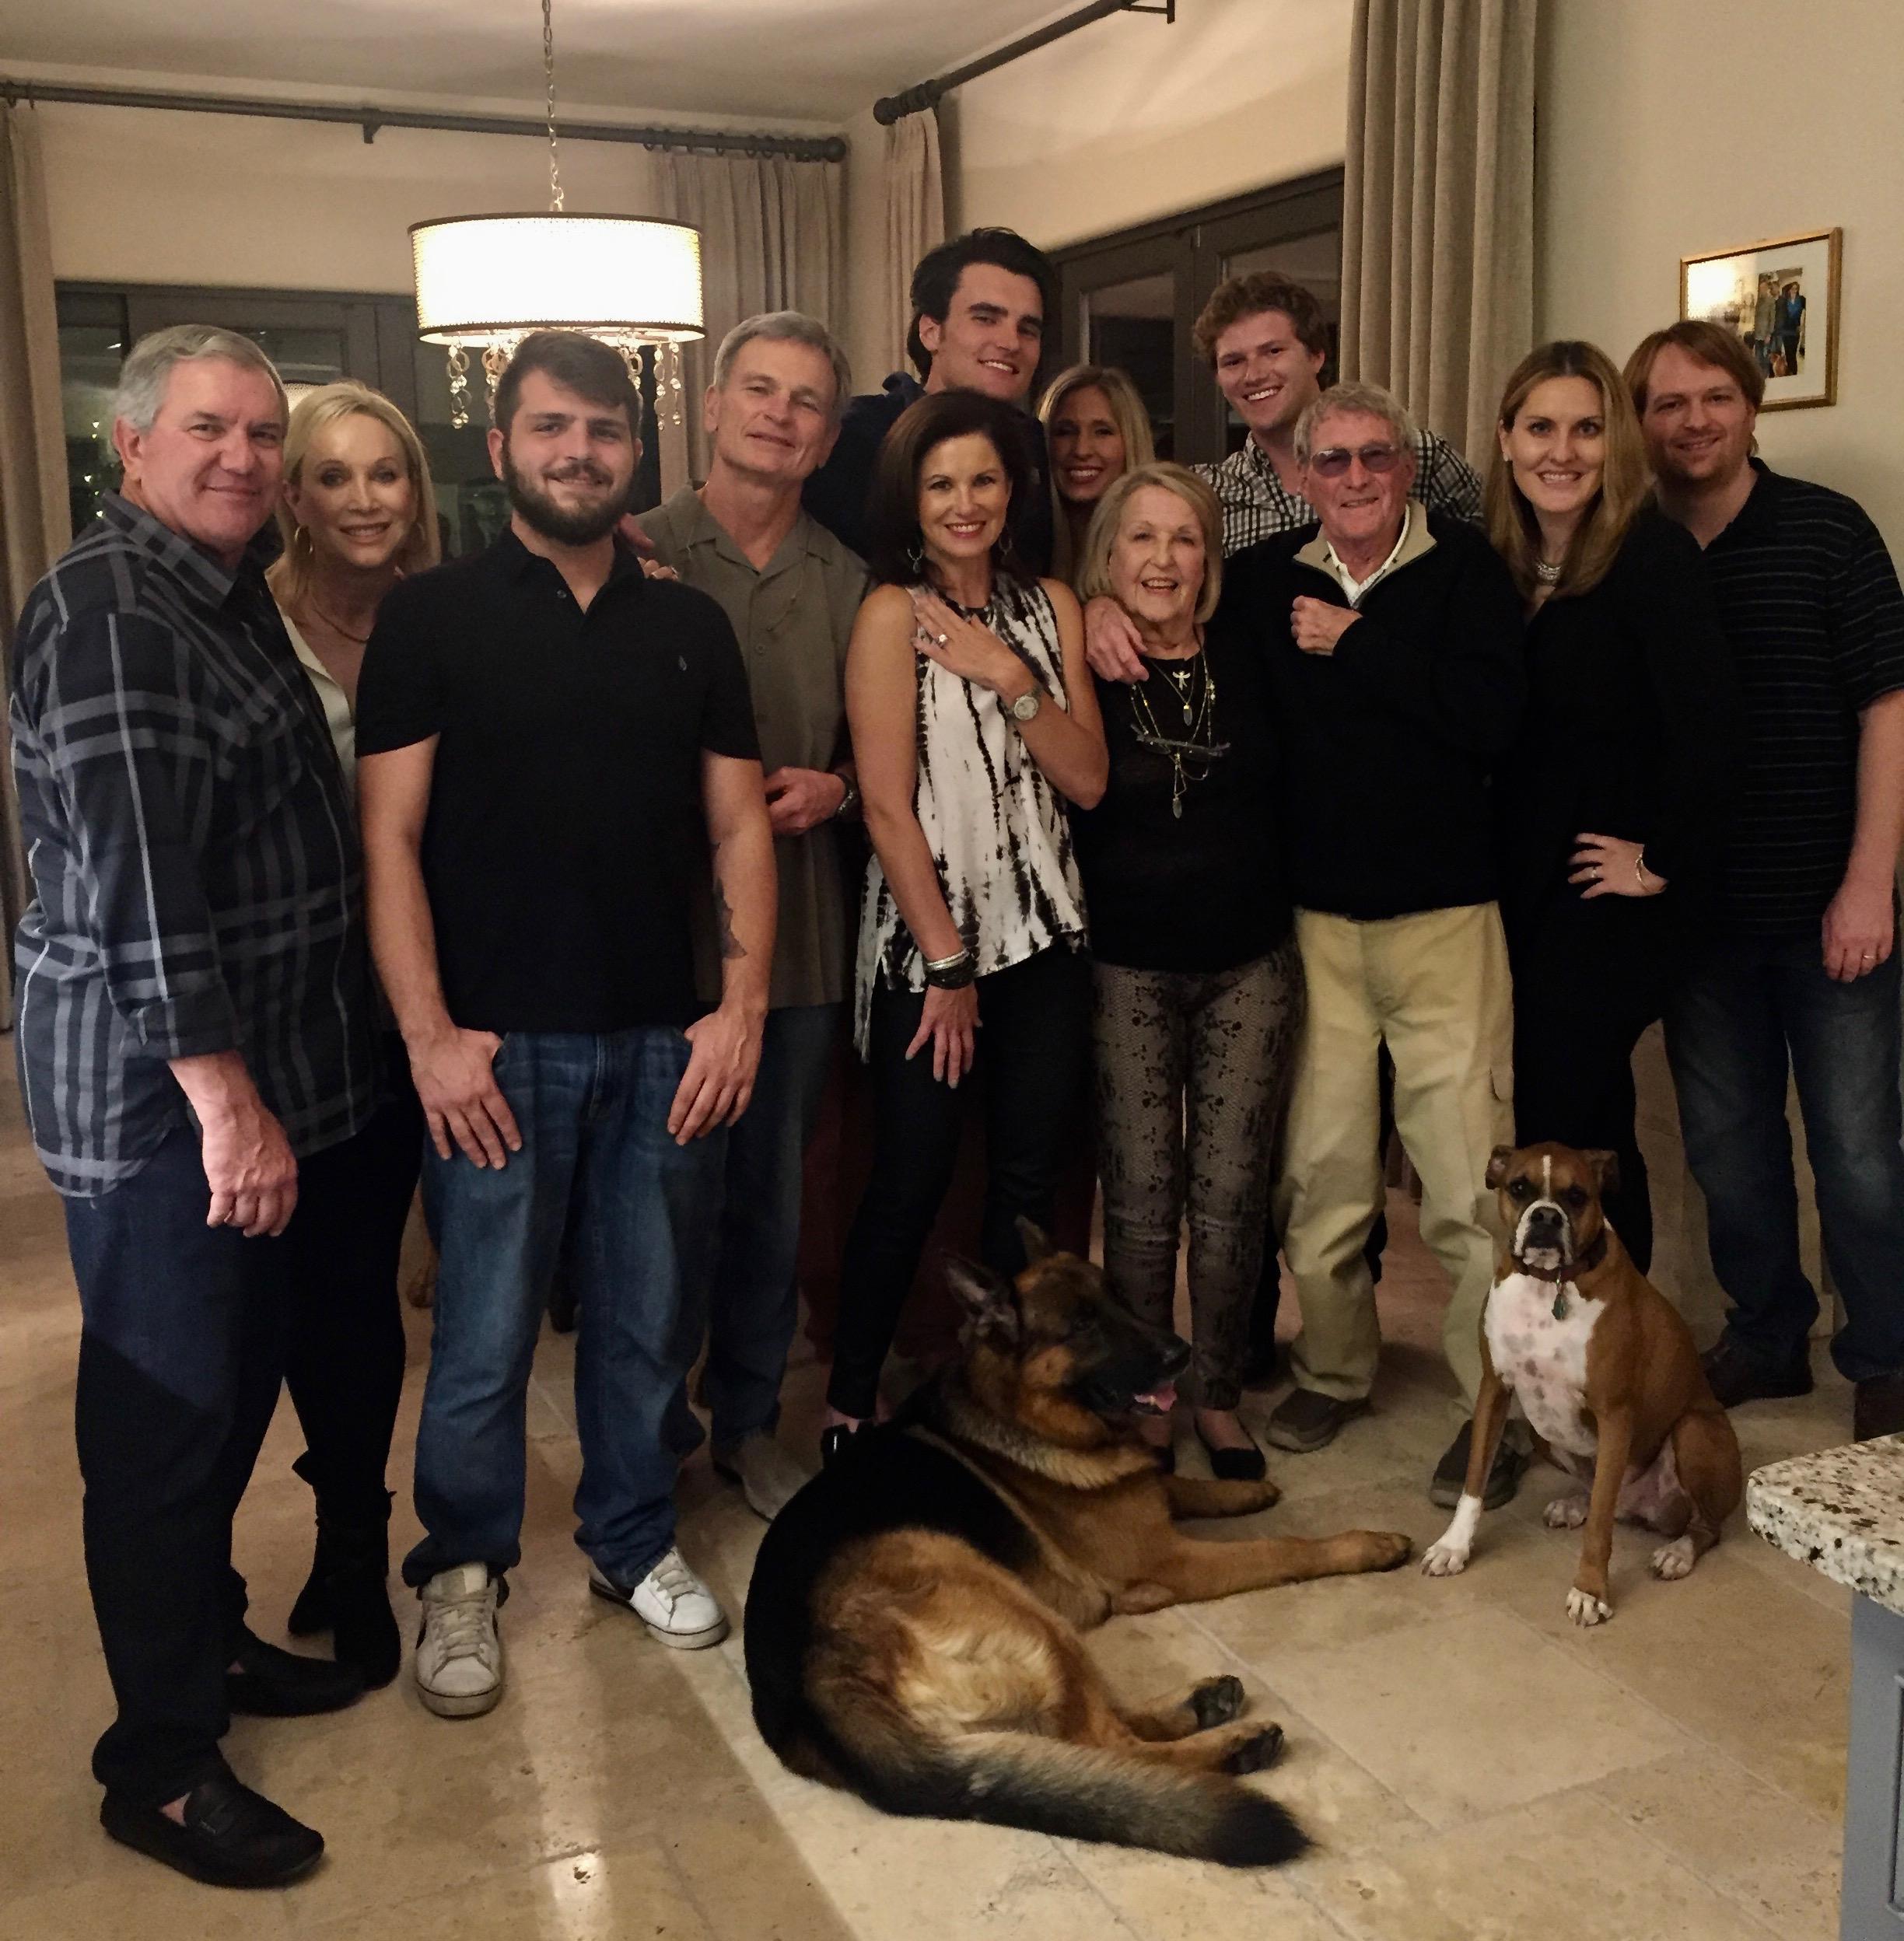 The Hilliard family -